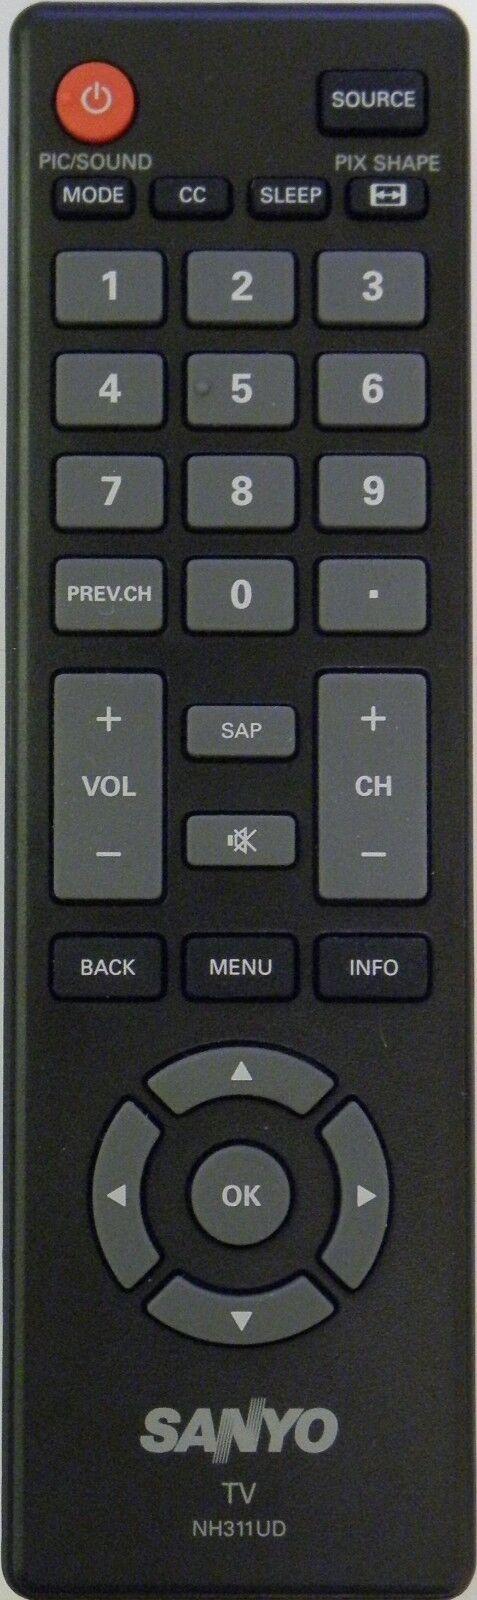 SANYO NH311UD TV Remote Control - BRAND NEW Original SANYO N